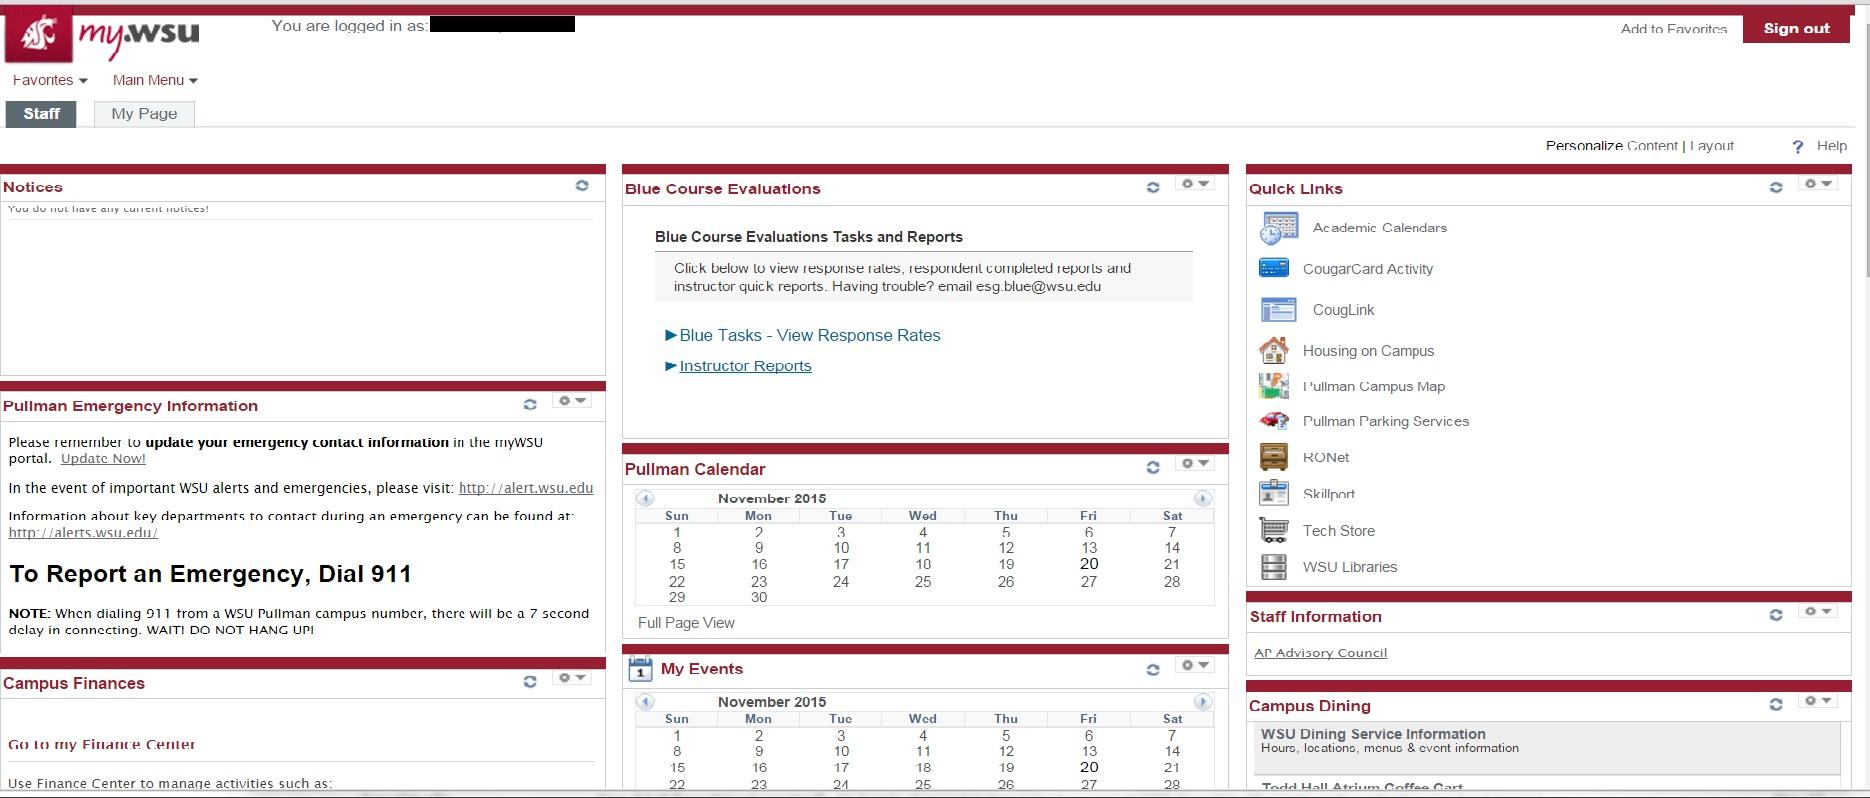 Wsu environmental health safety environmental health - Mywsu Homepage